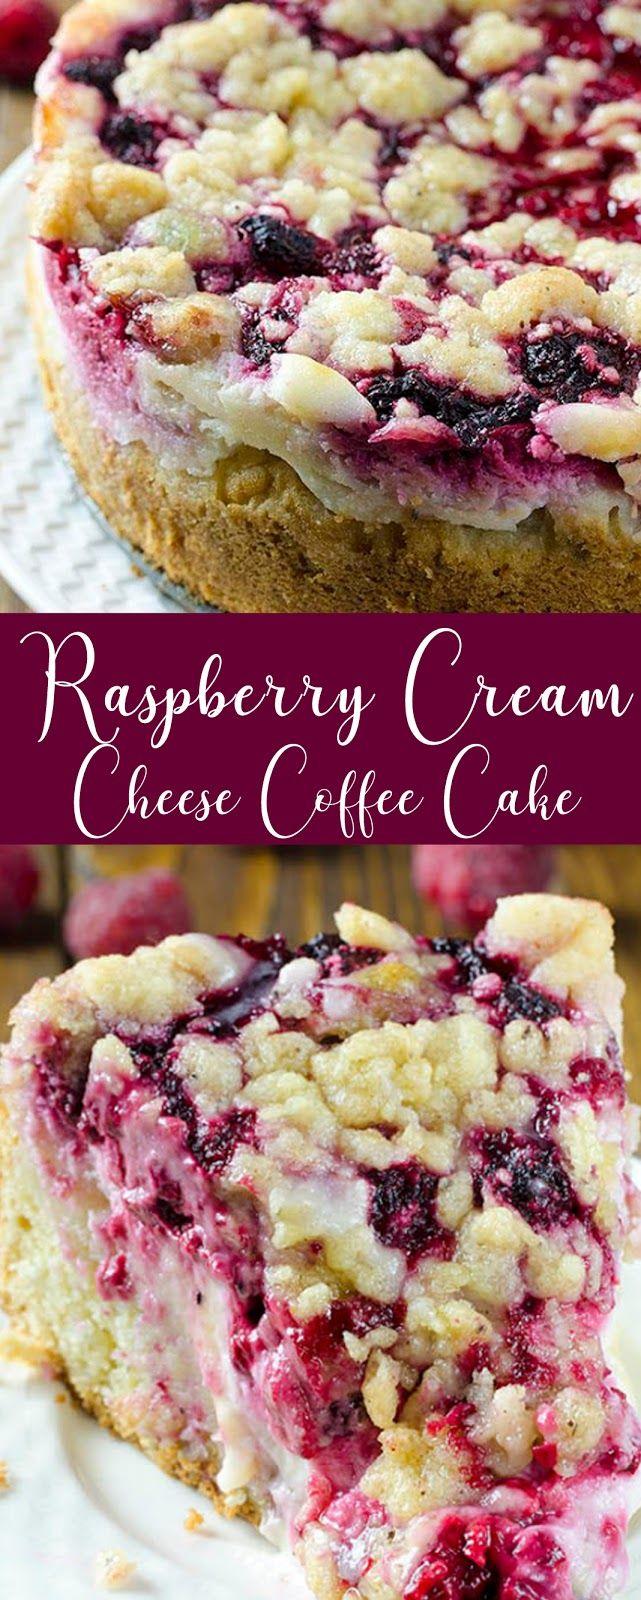 Recipe Raspberry Cream Cheese Coffee Cake #cake